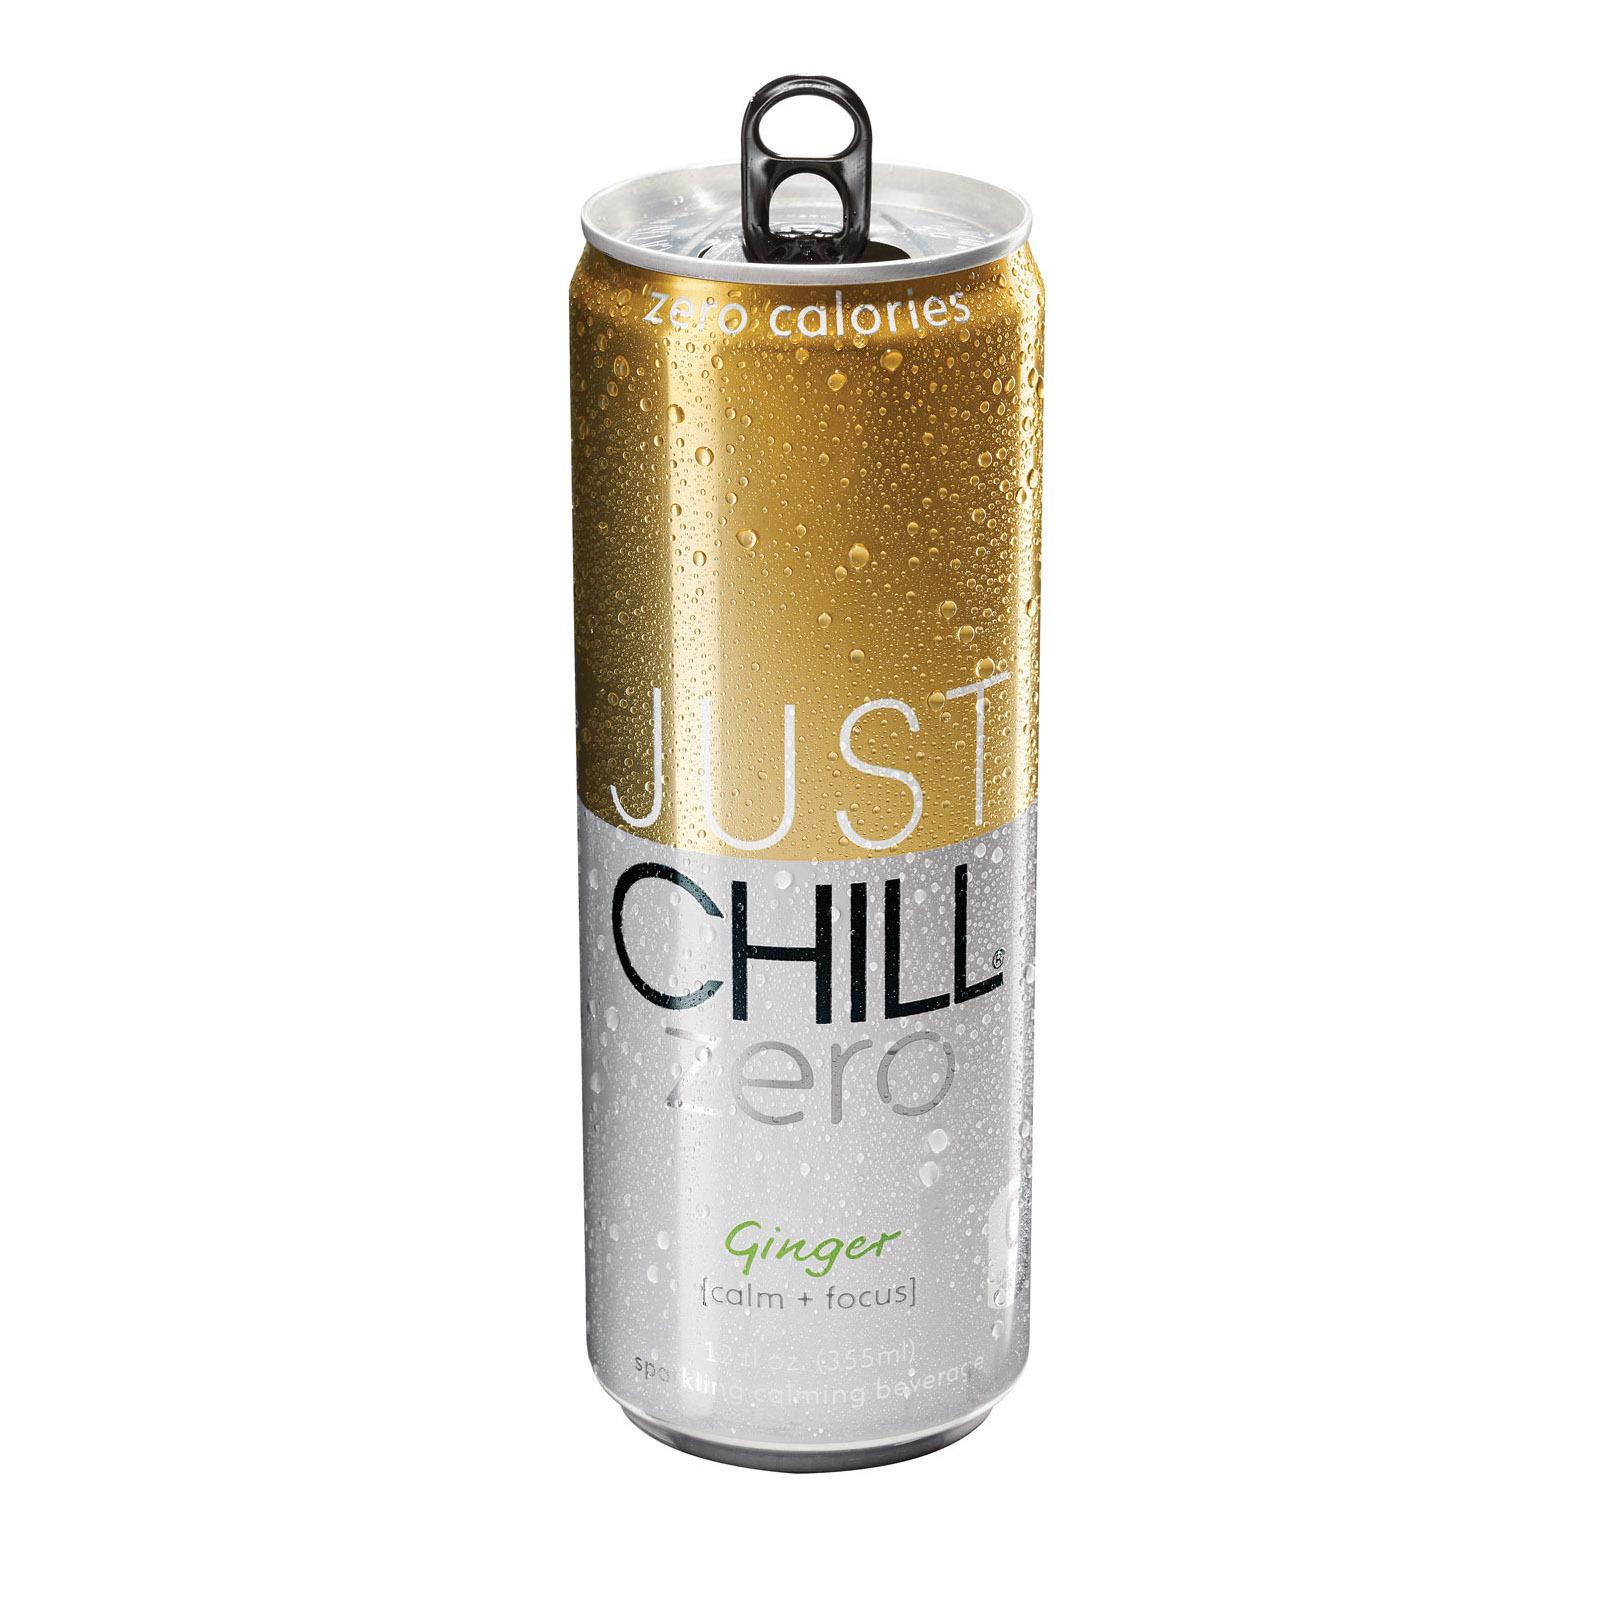 Just Chill Drink - Zero Ginger - Case of 12 - 12 Fl oz.